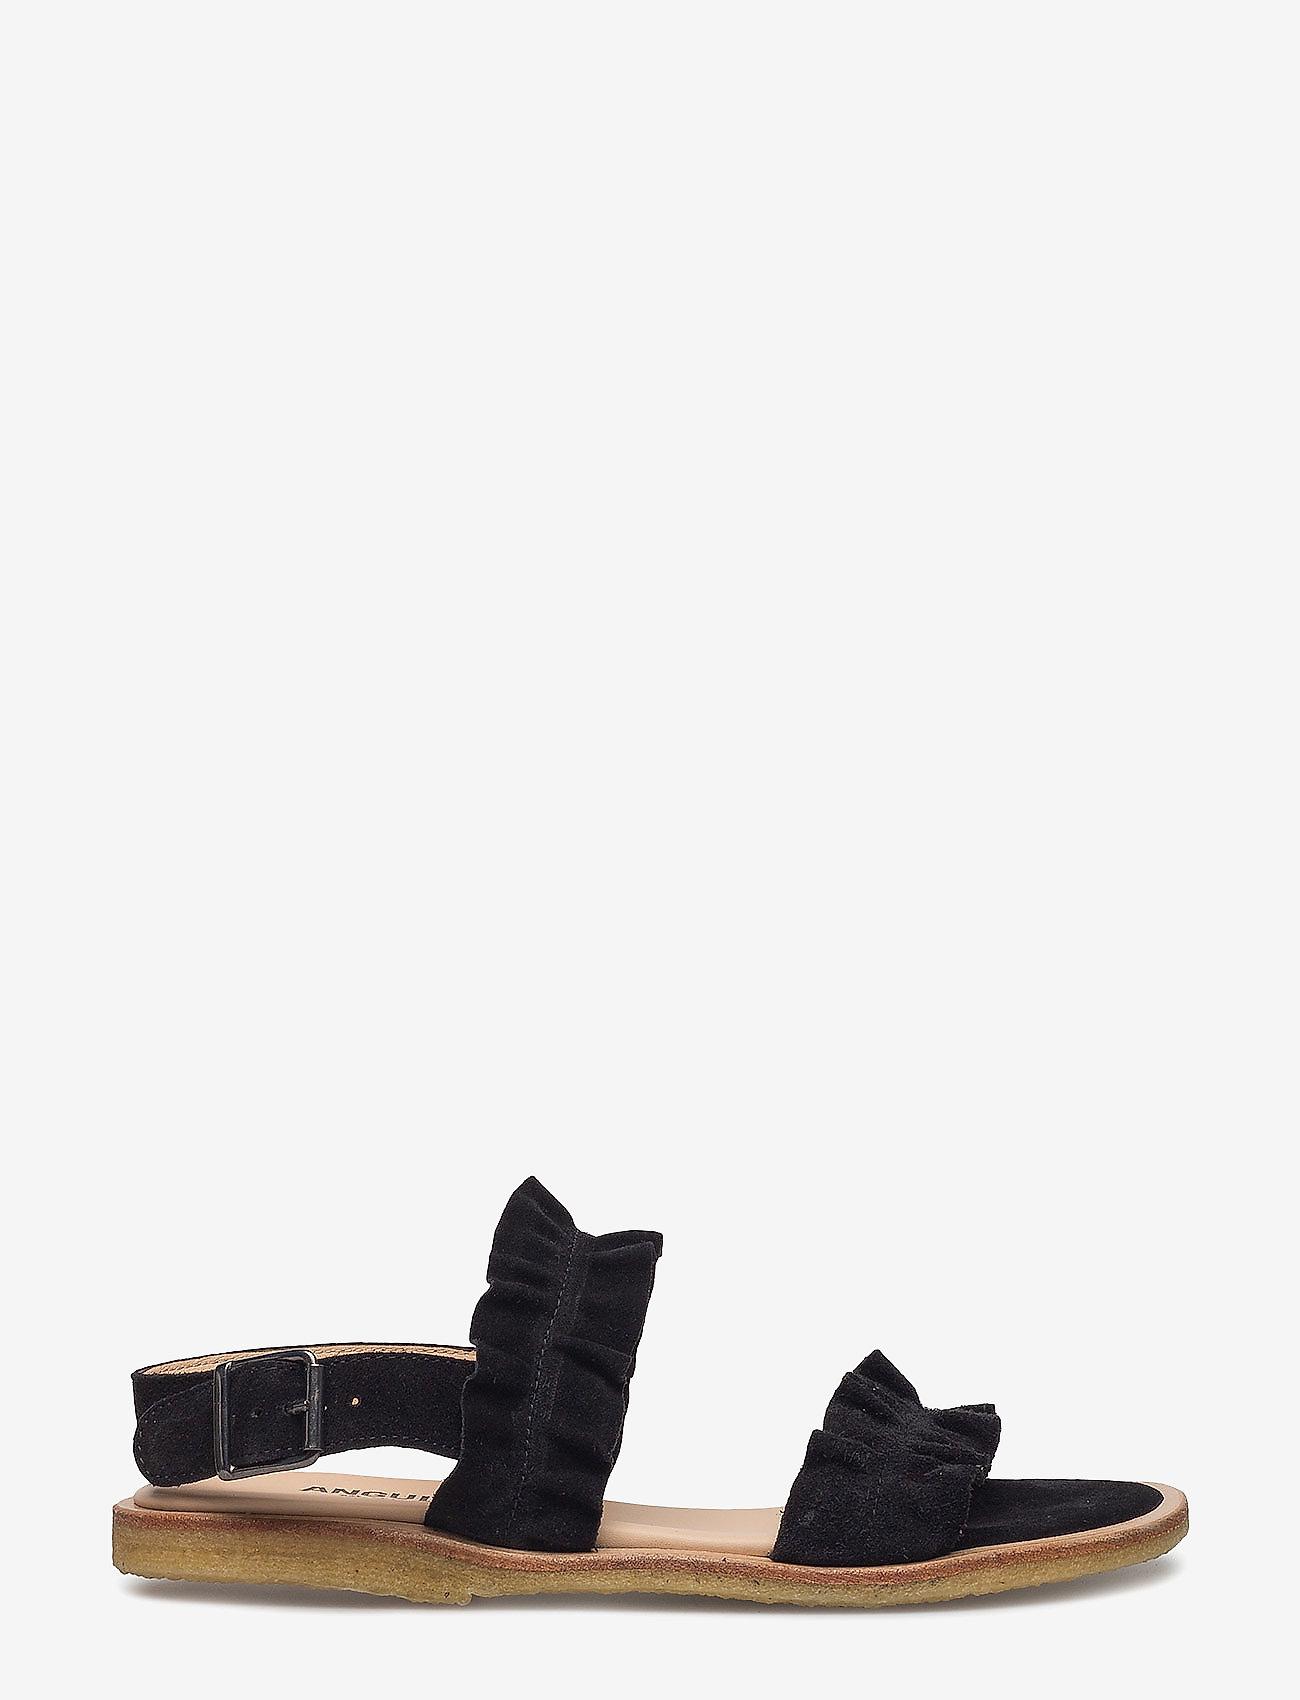 Sandals - Flat - Open Toe - Op (1163 Black) - ANGULUS 6cZiXZ